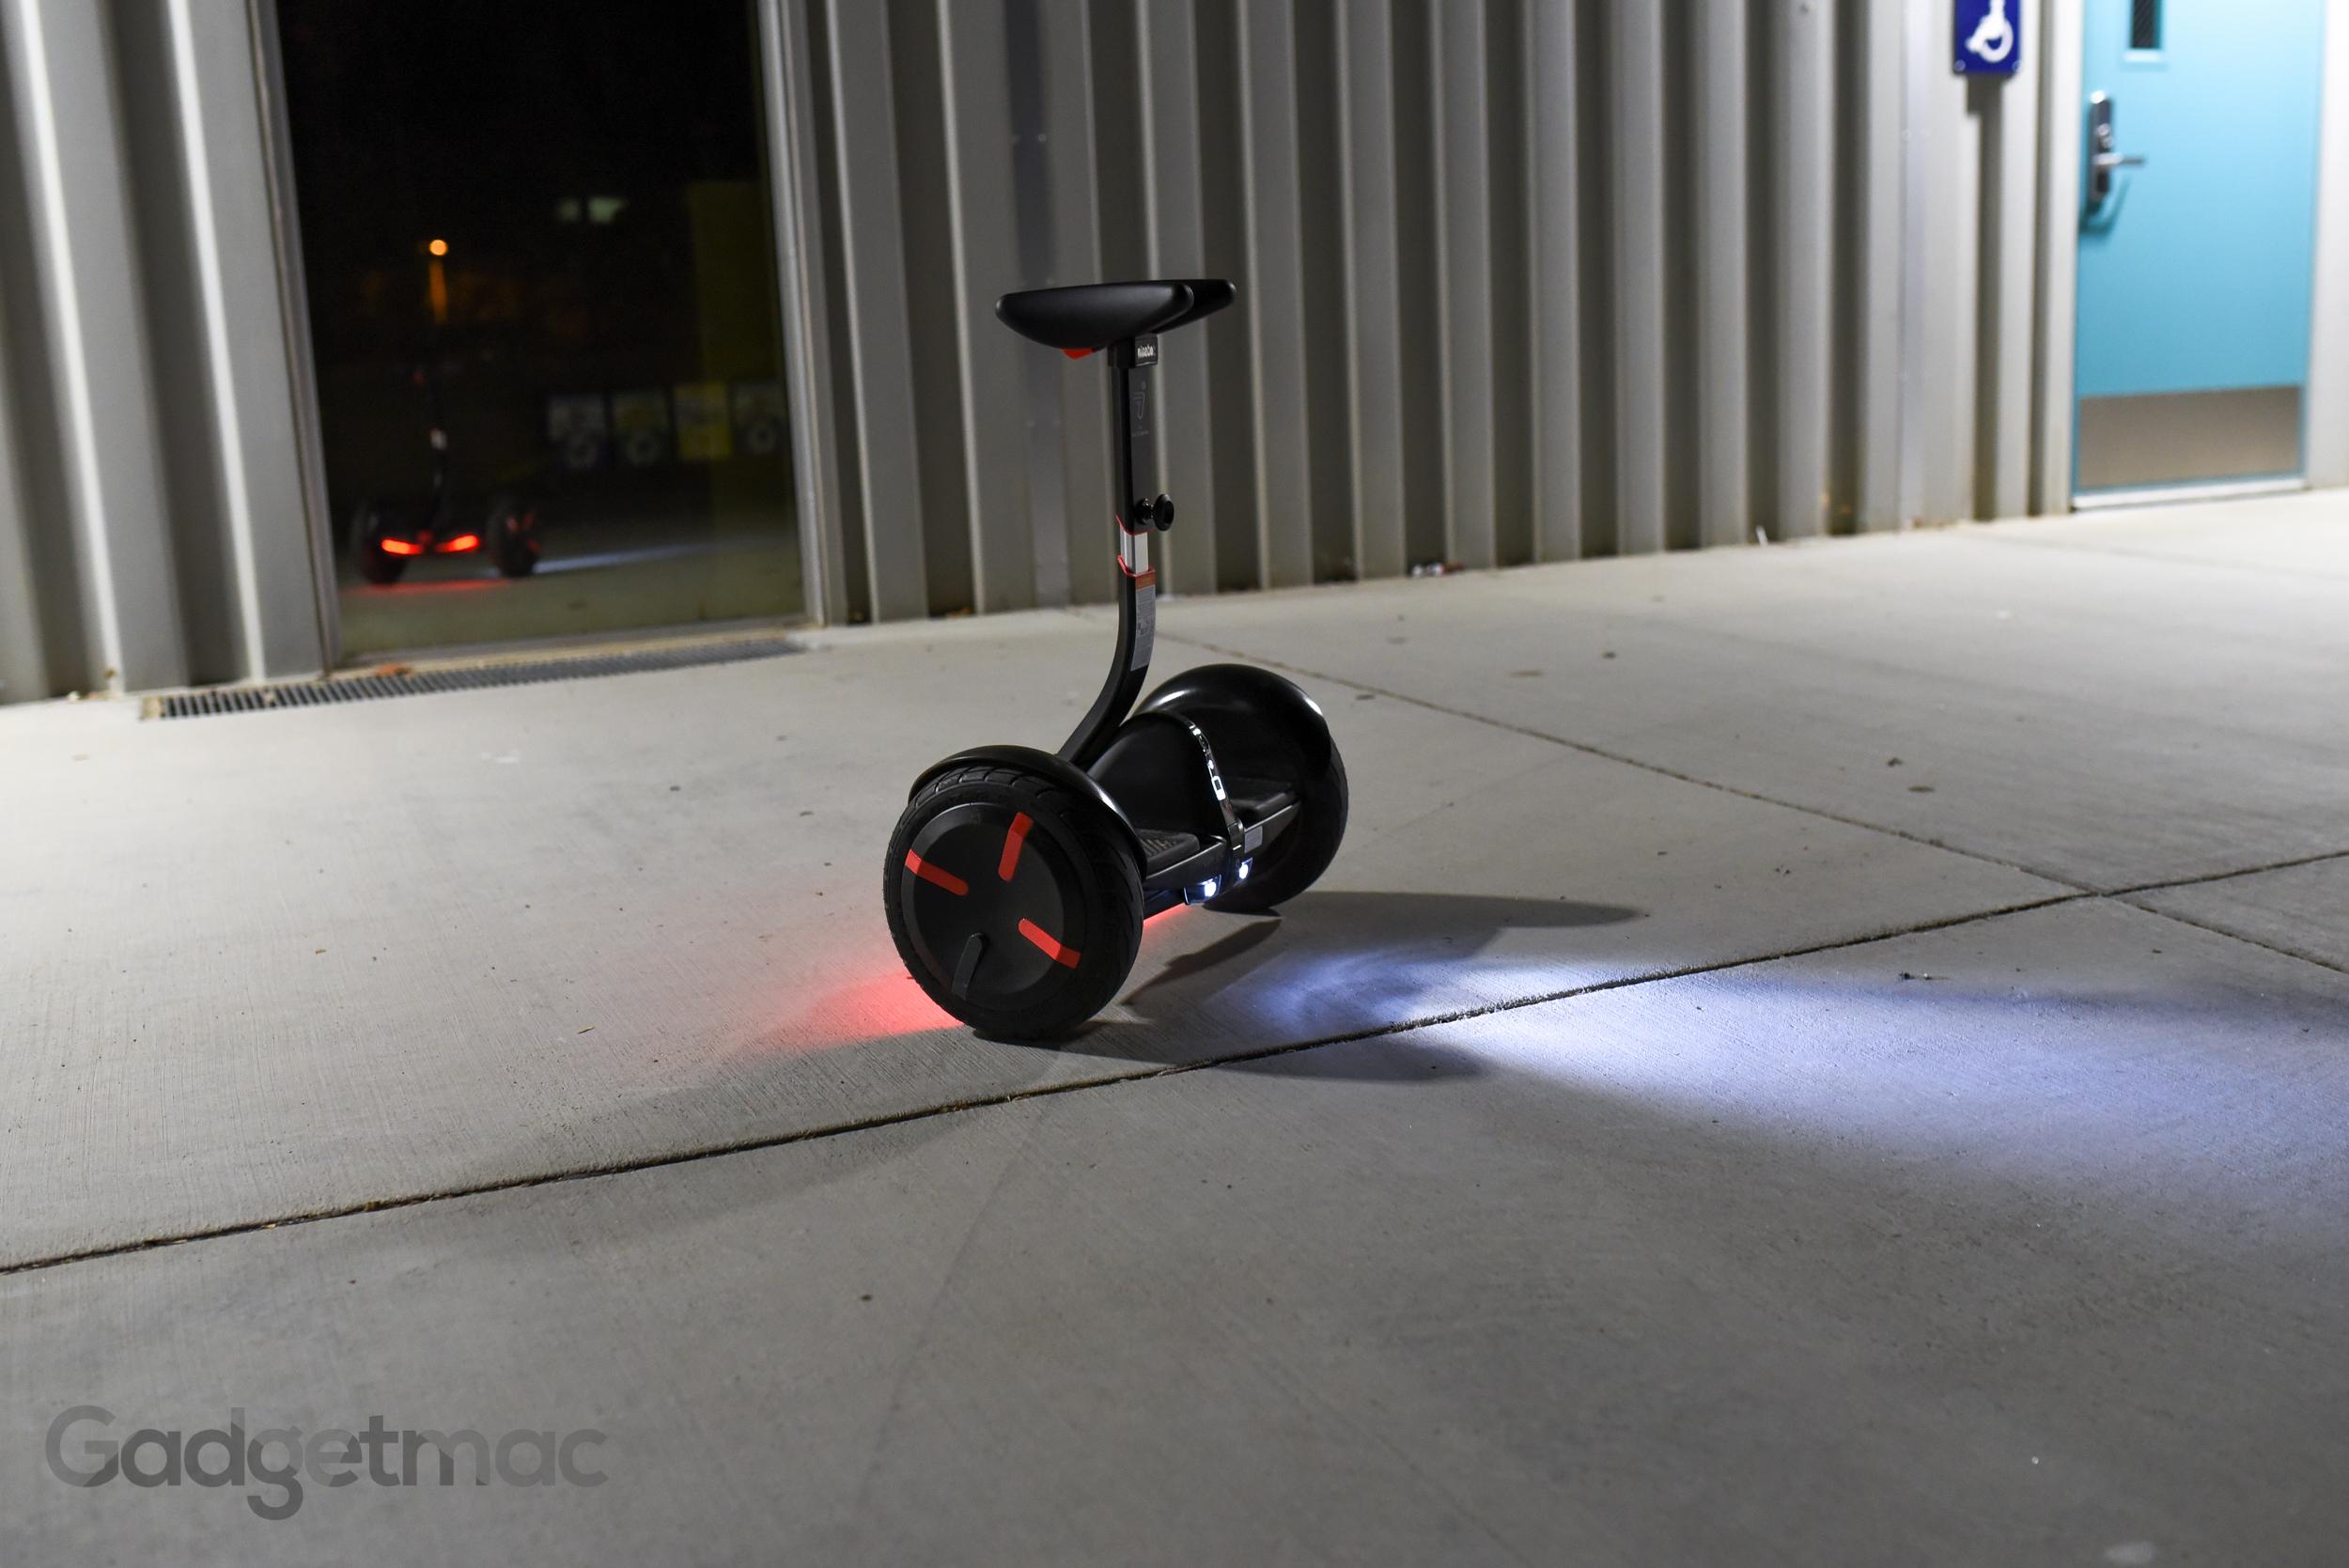 segway-ninebot-minipro-headlights.jpg